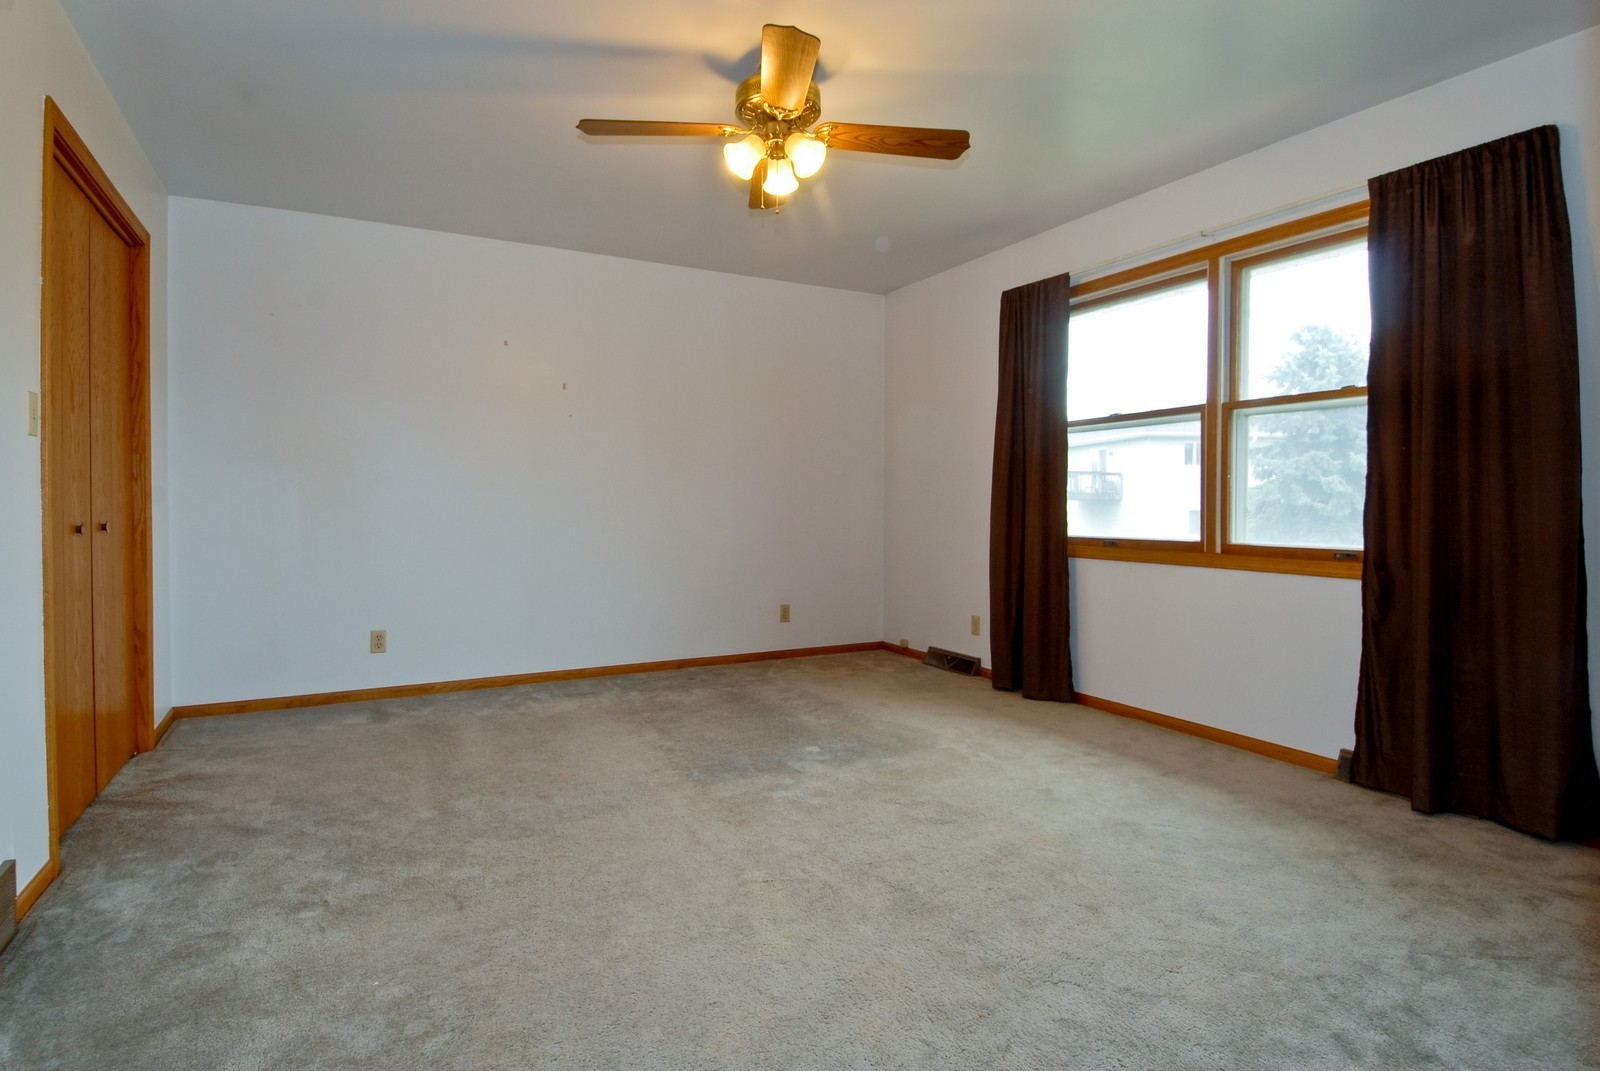 Real Estate Photography - 210 Pardridge Pl, Dekalb, IL, 60115 - Master Bedroom